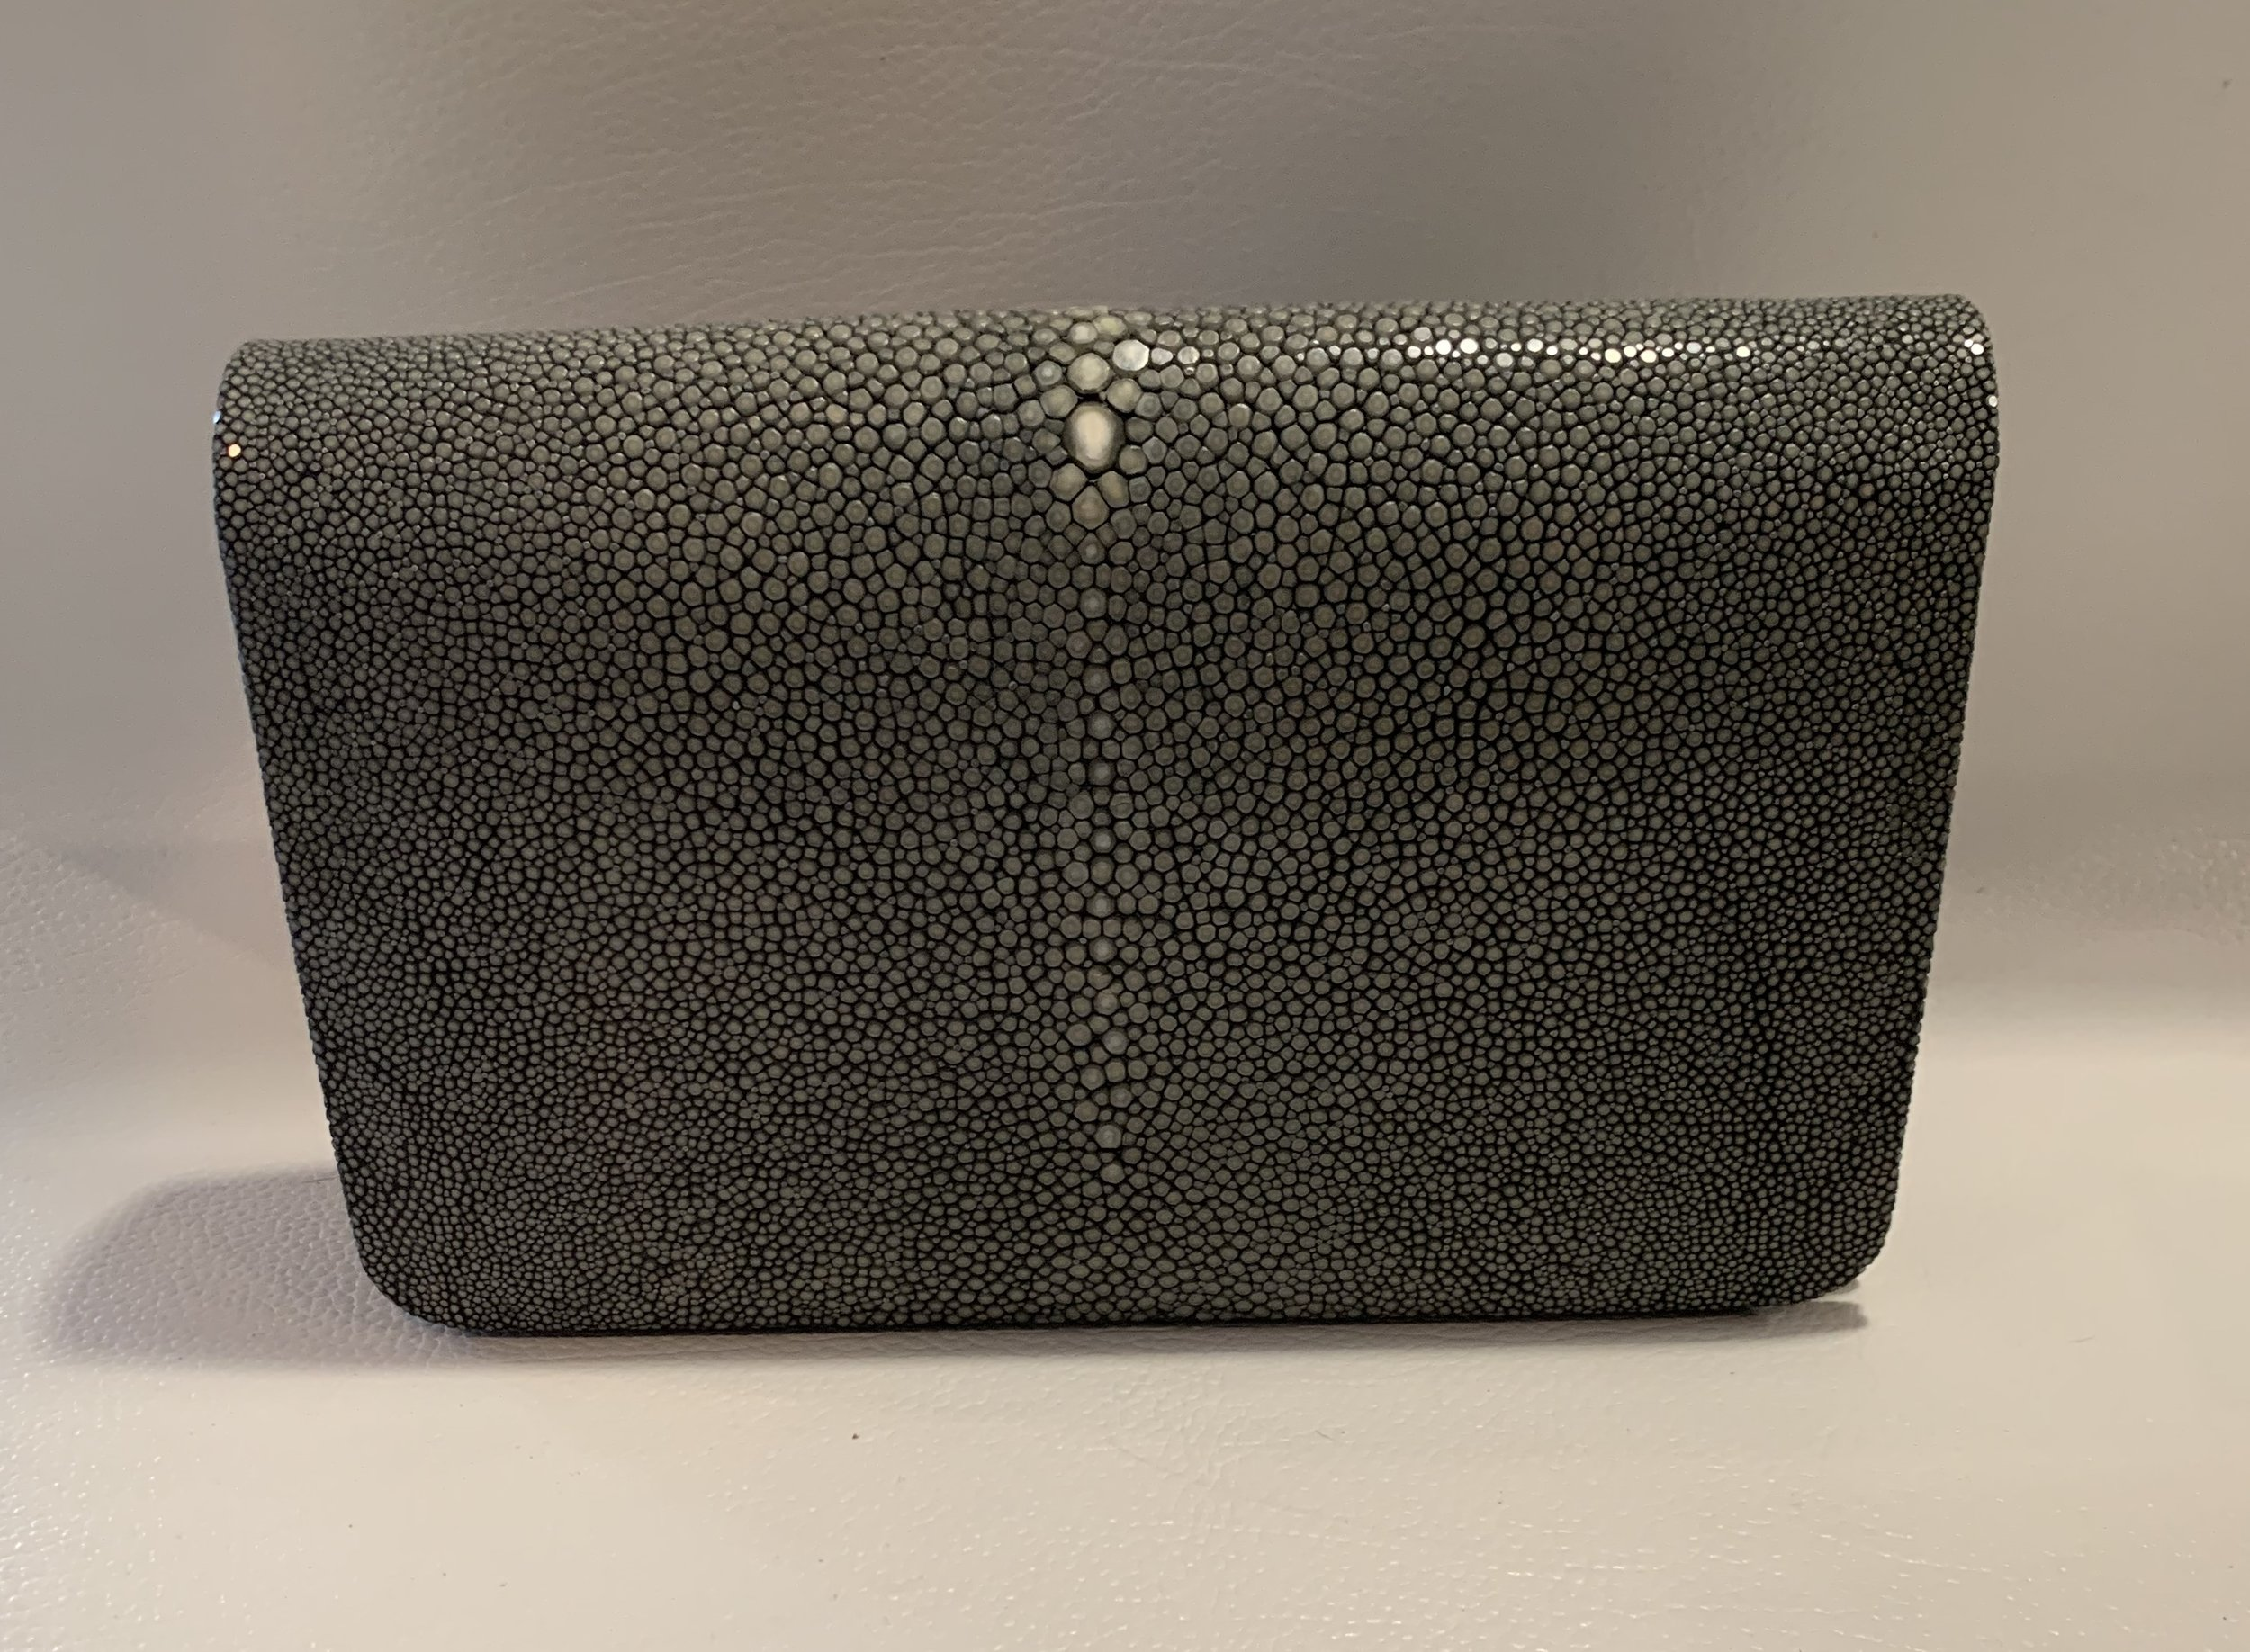 Timeless Stingray Bag/Clutch 699.00